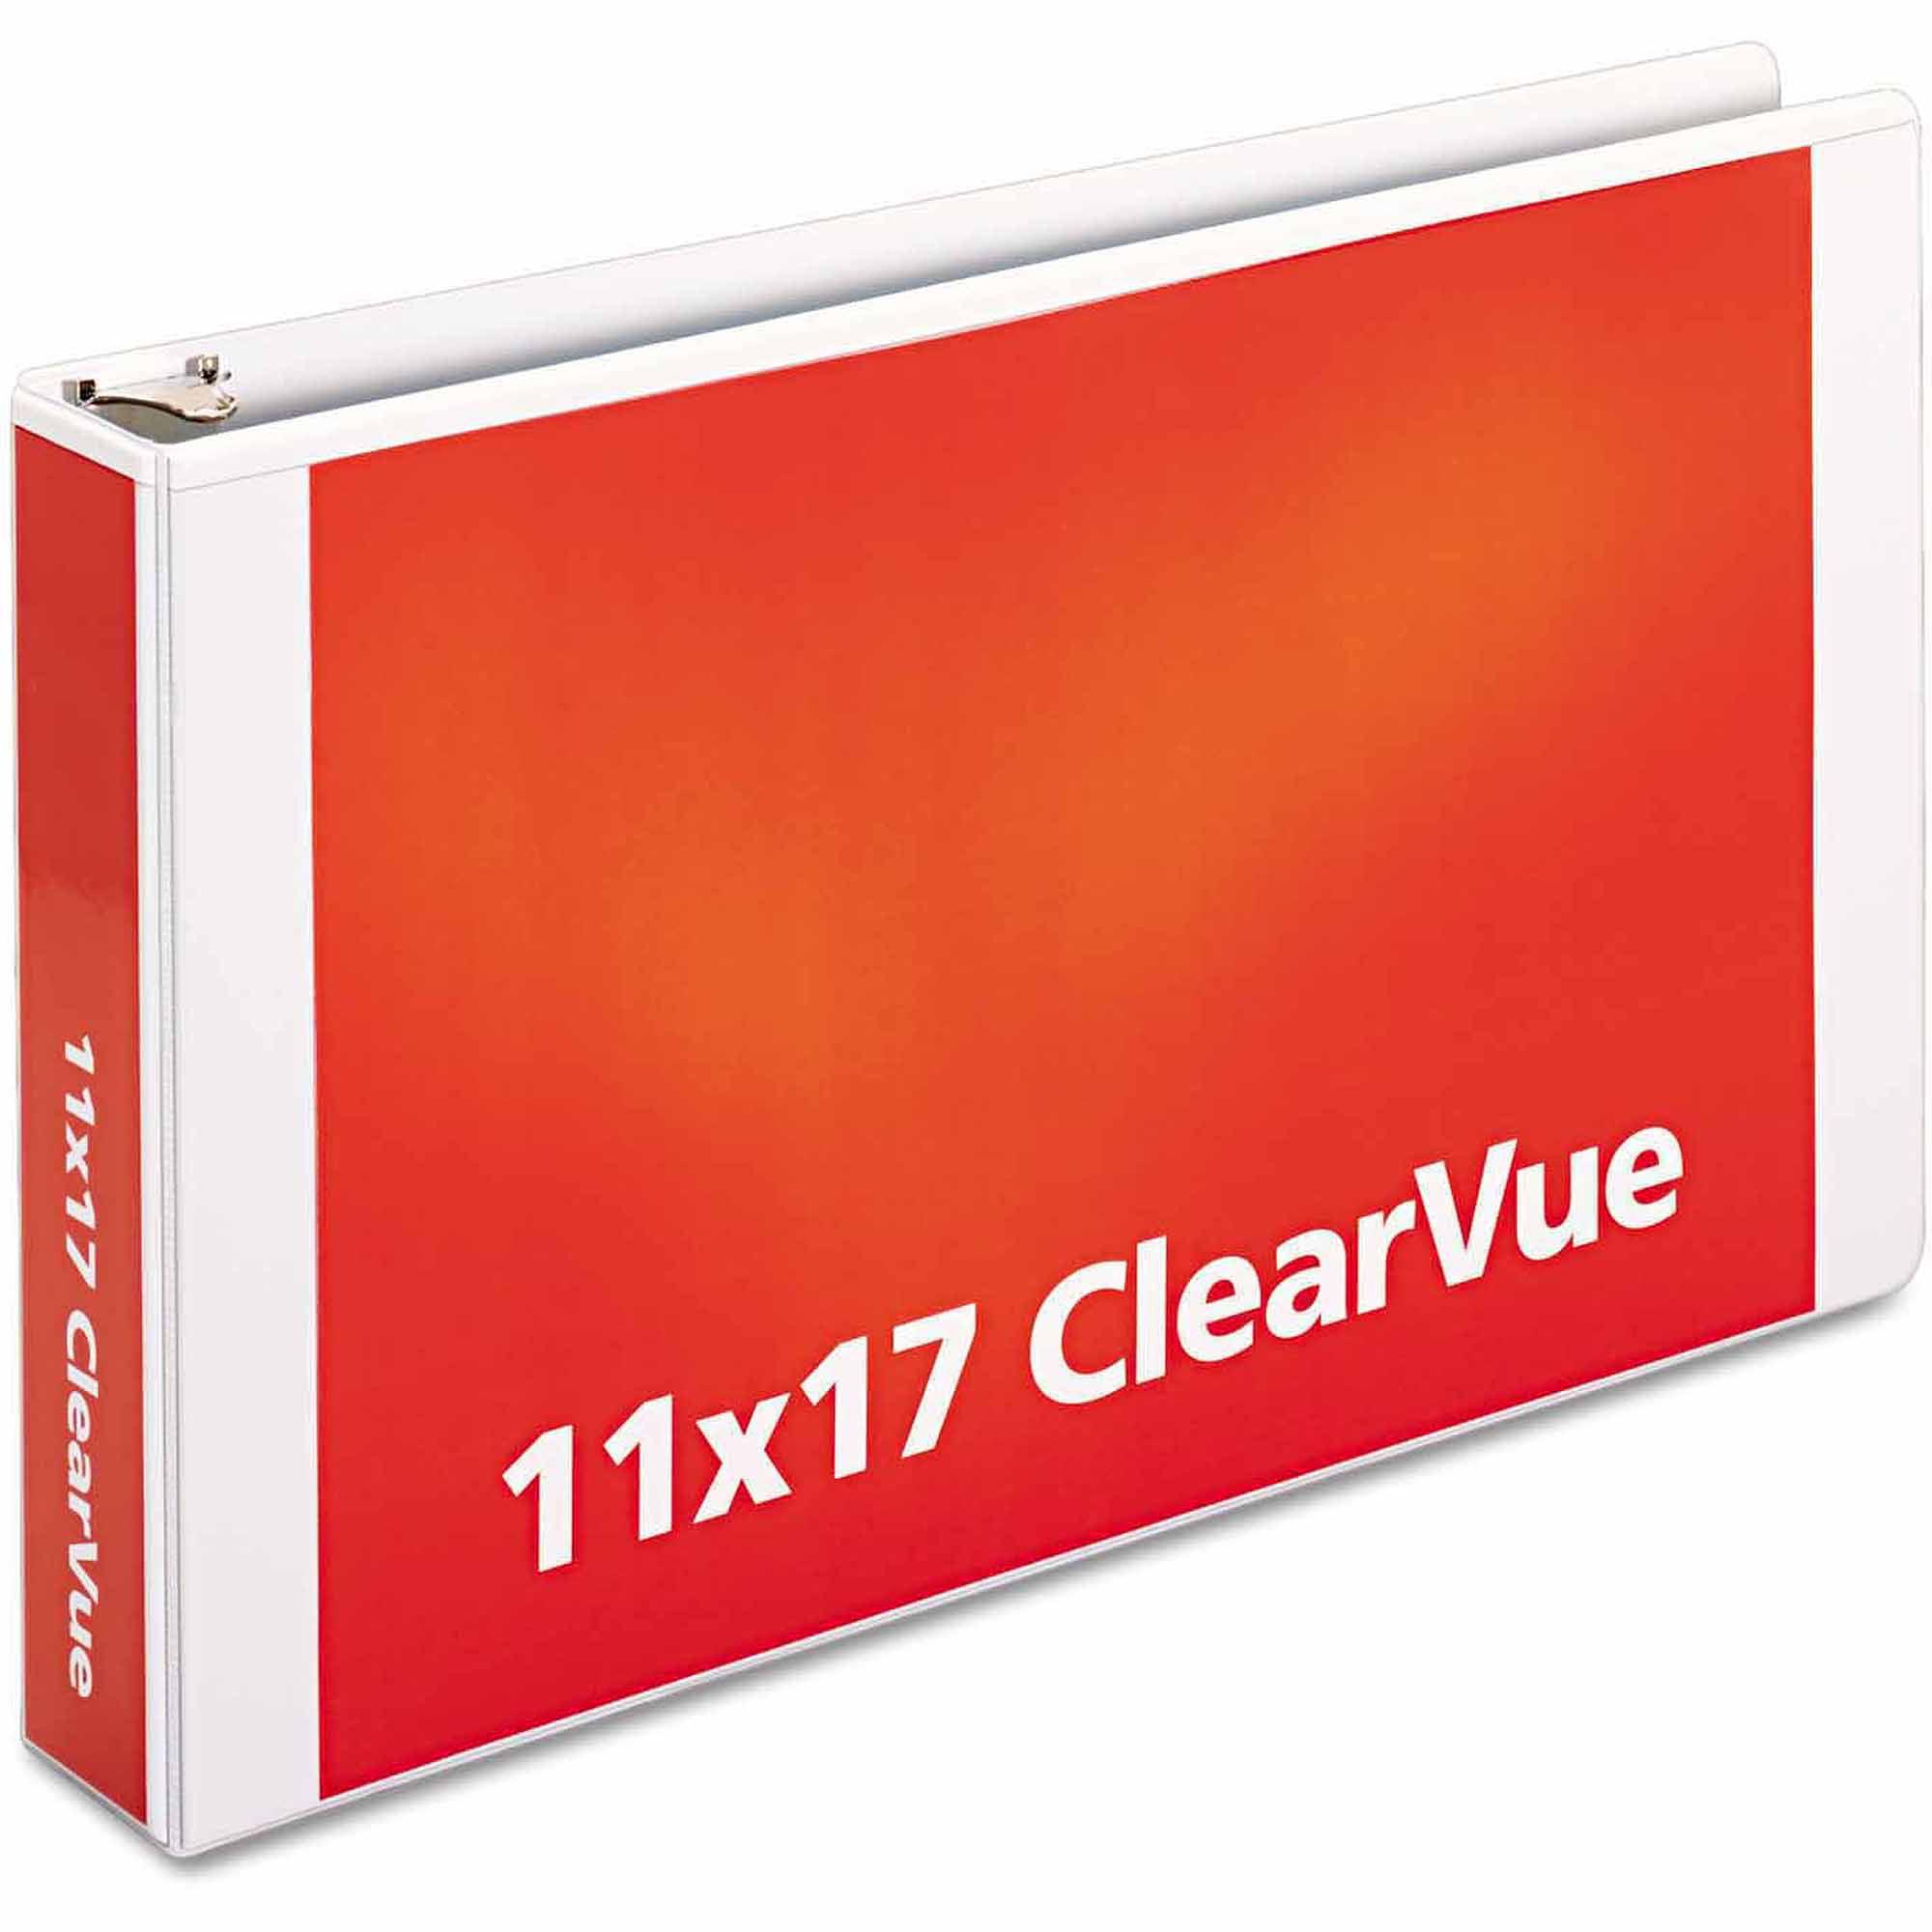 "Cardinal Tabloid ClearVue Slant-D Ring Binder, 2"" Capacity, 11"" x 17"", White"